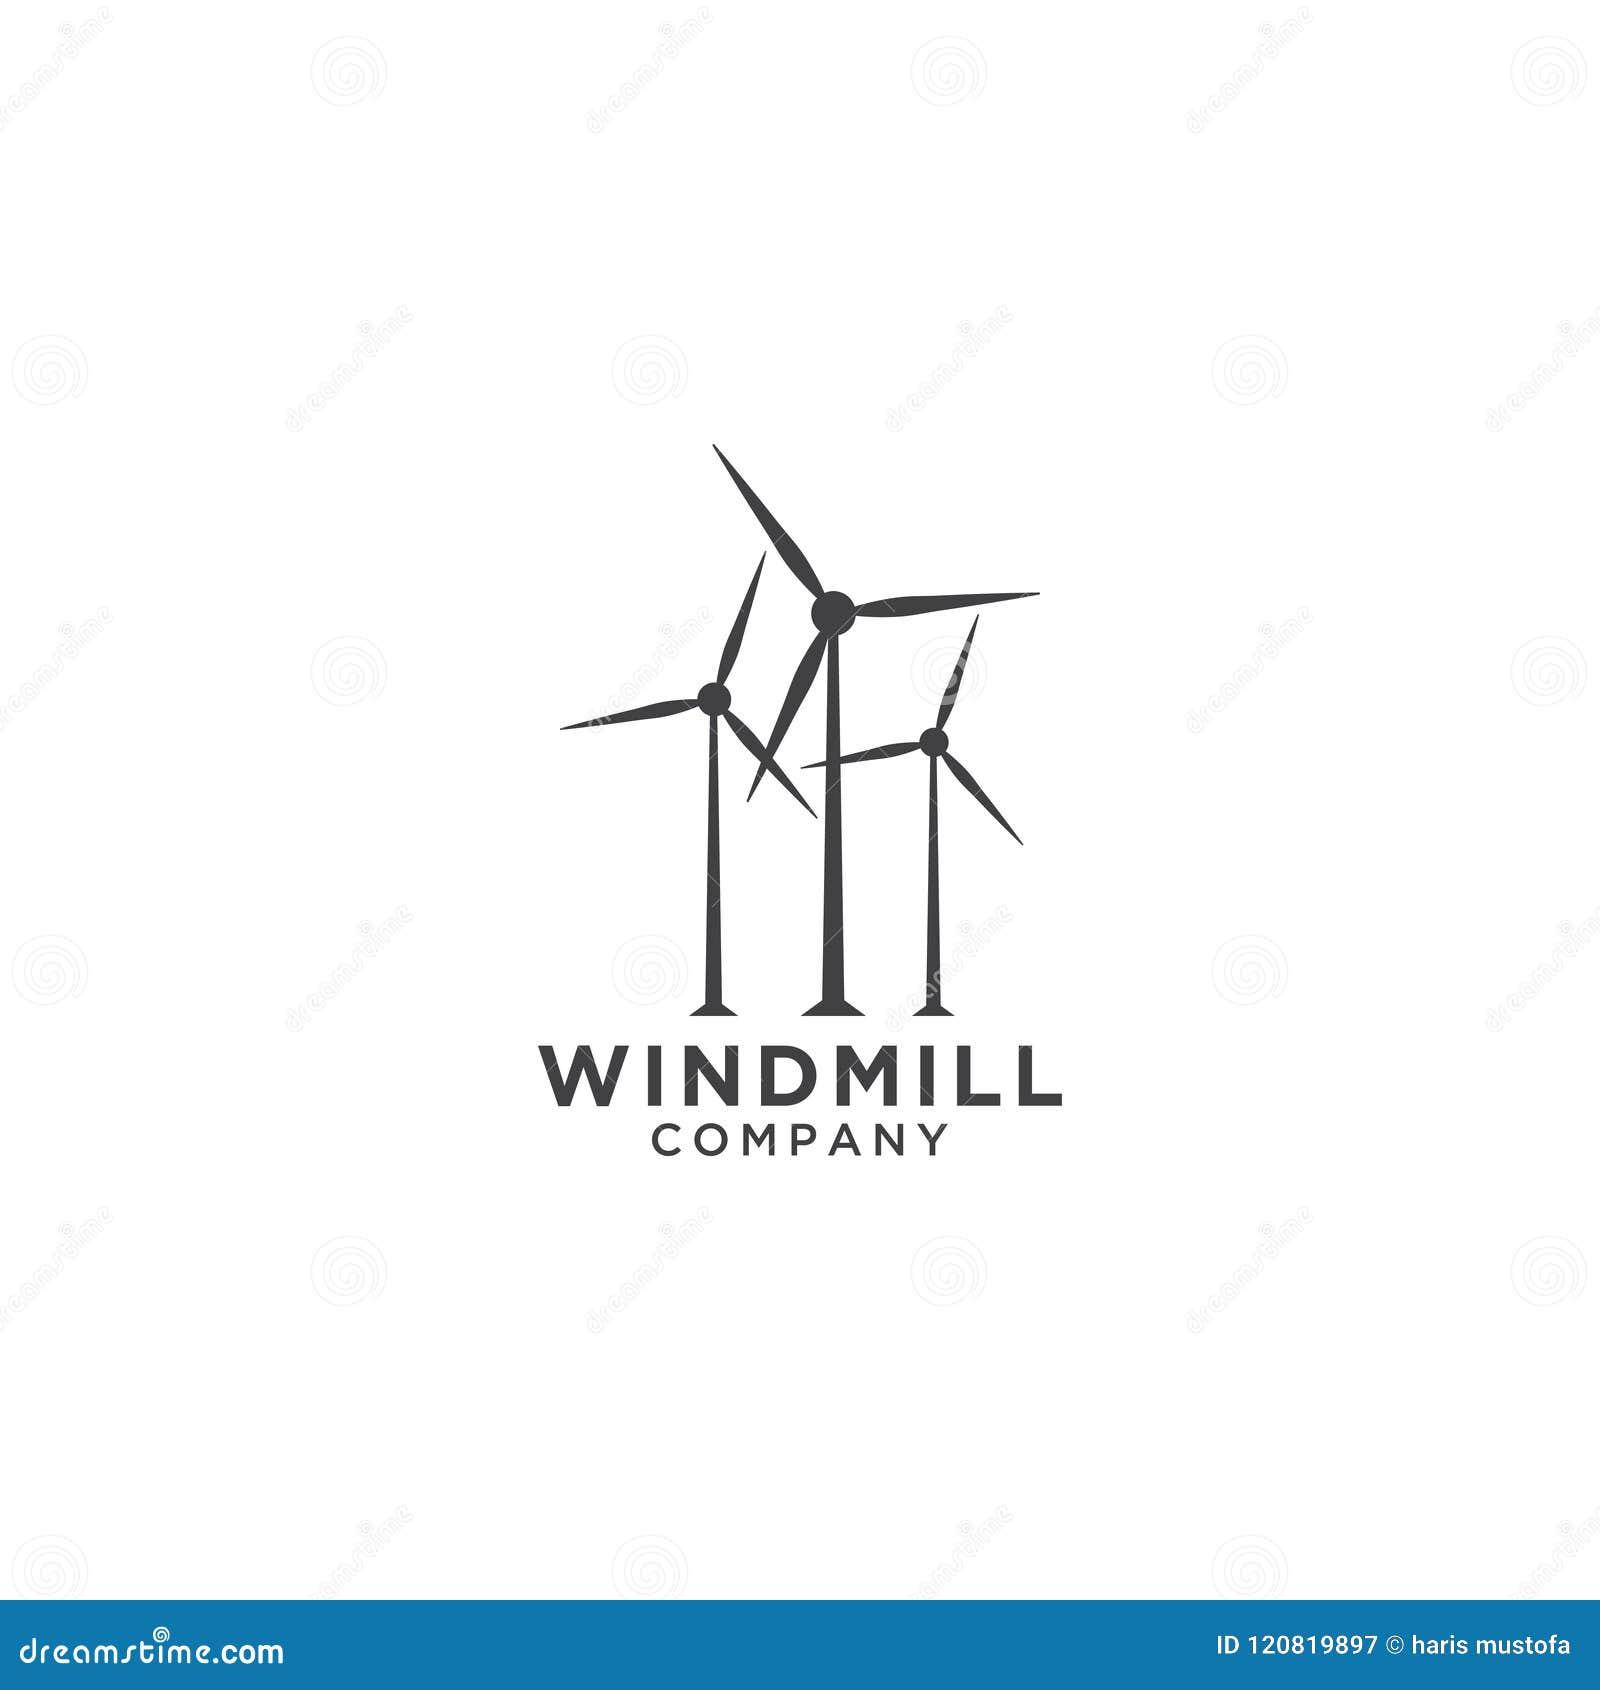 windmill logo design template stock vector illustration of wheat